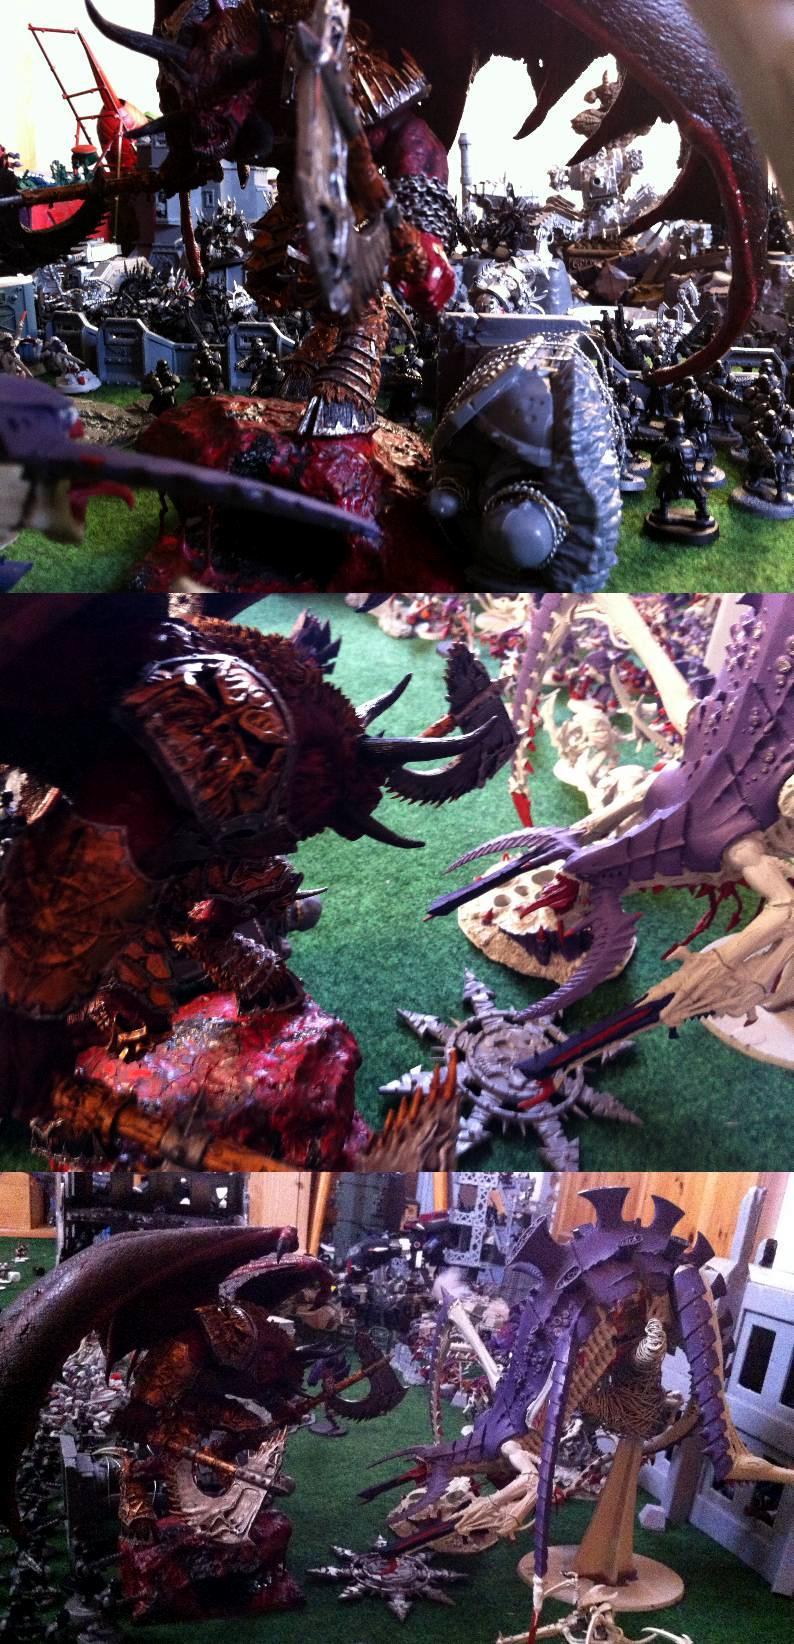 An´ggrath, Anggrath, Apocalypse, Apocalyptical Battle, Battle, Battles, Blood, Bloodthirster, Chaos, Chaos Space Marines, Conversion, Daemons, Demonlord, Exalted Bloodthirster, Exalted Daemon, Exalted Demon, Gargantuan, Gigantic, Greater Daemon, Hierophant, Hive, Iron Warriors, Ka'jagga'nath, Kajagganath, Khorne, Khornelord, Nids, Skarbrand, Storm Of Magic, Titan, Tyranids